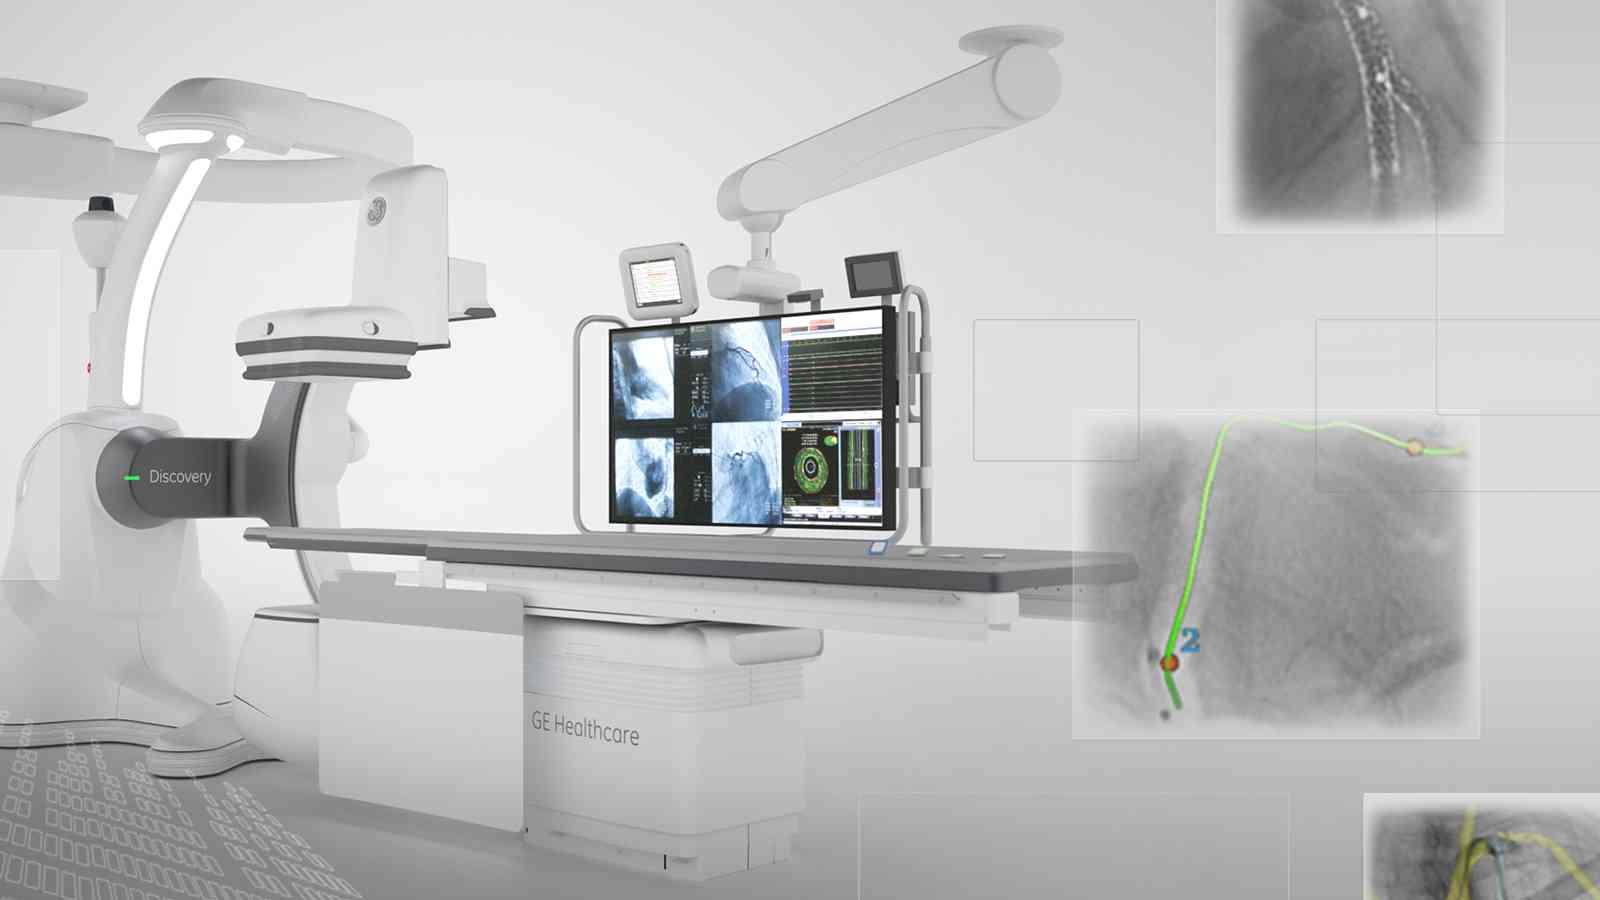 GE血管机PCI ASSIST在心脏介入中的应用价值